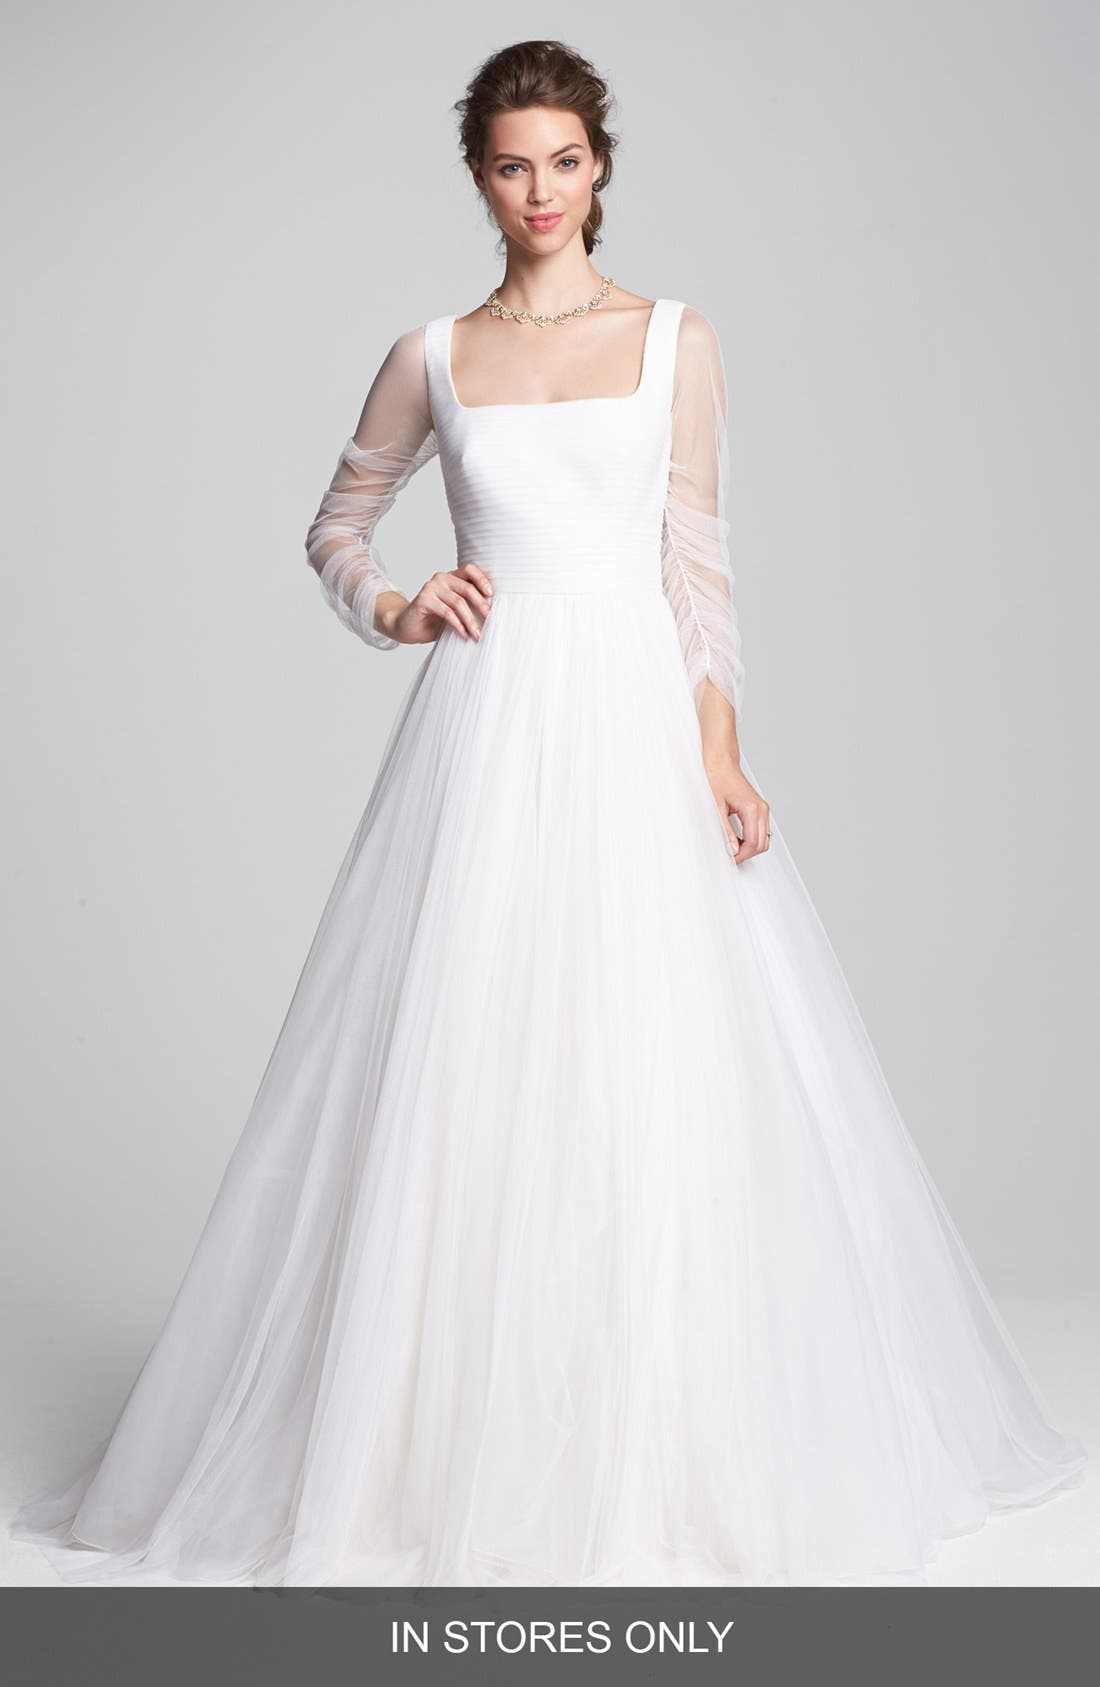 Main Image - Rosa Clara 'Belinda' Full Skirt Chiffon Dress (In Stores Only)